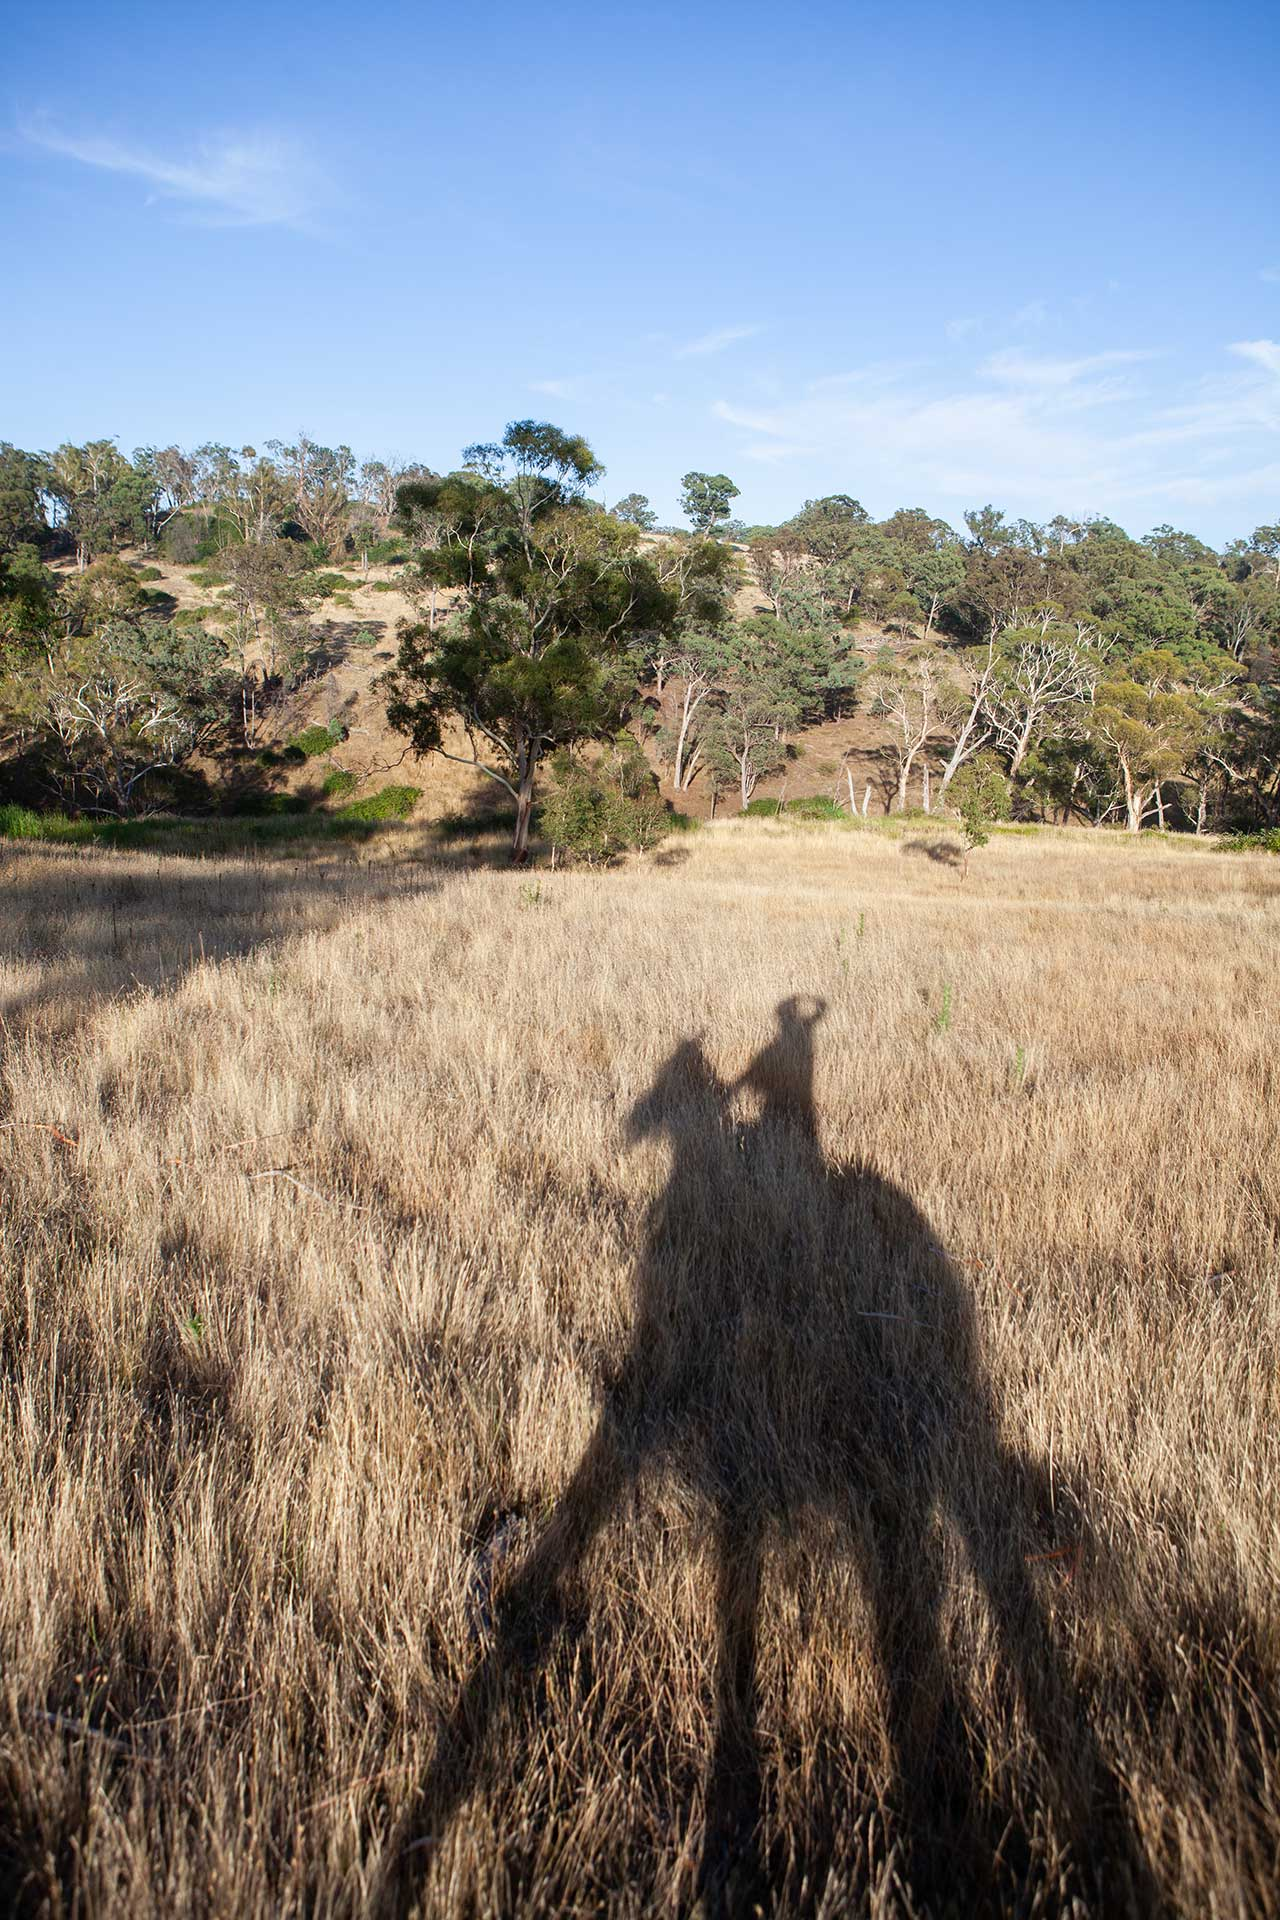 angela pfeiffer fotografin, angela pfeiffer, pferdefotografin, auf tony in australien, pferdefotos, pferdeportraits, authentische pferdefotografie, individuelle pferdefotografie, pferdefotografie in norddeutschland